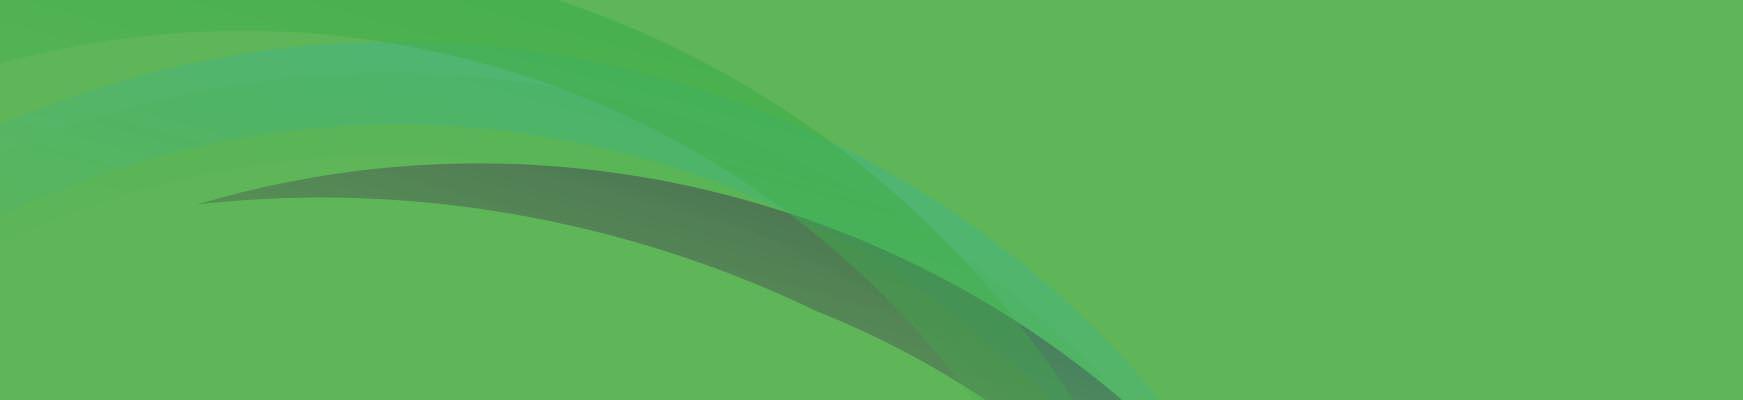 Banner-Swirl